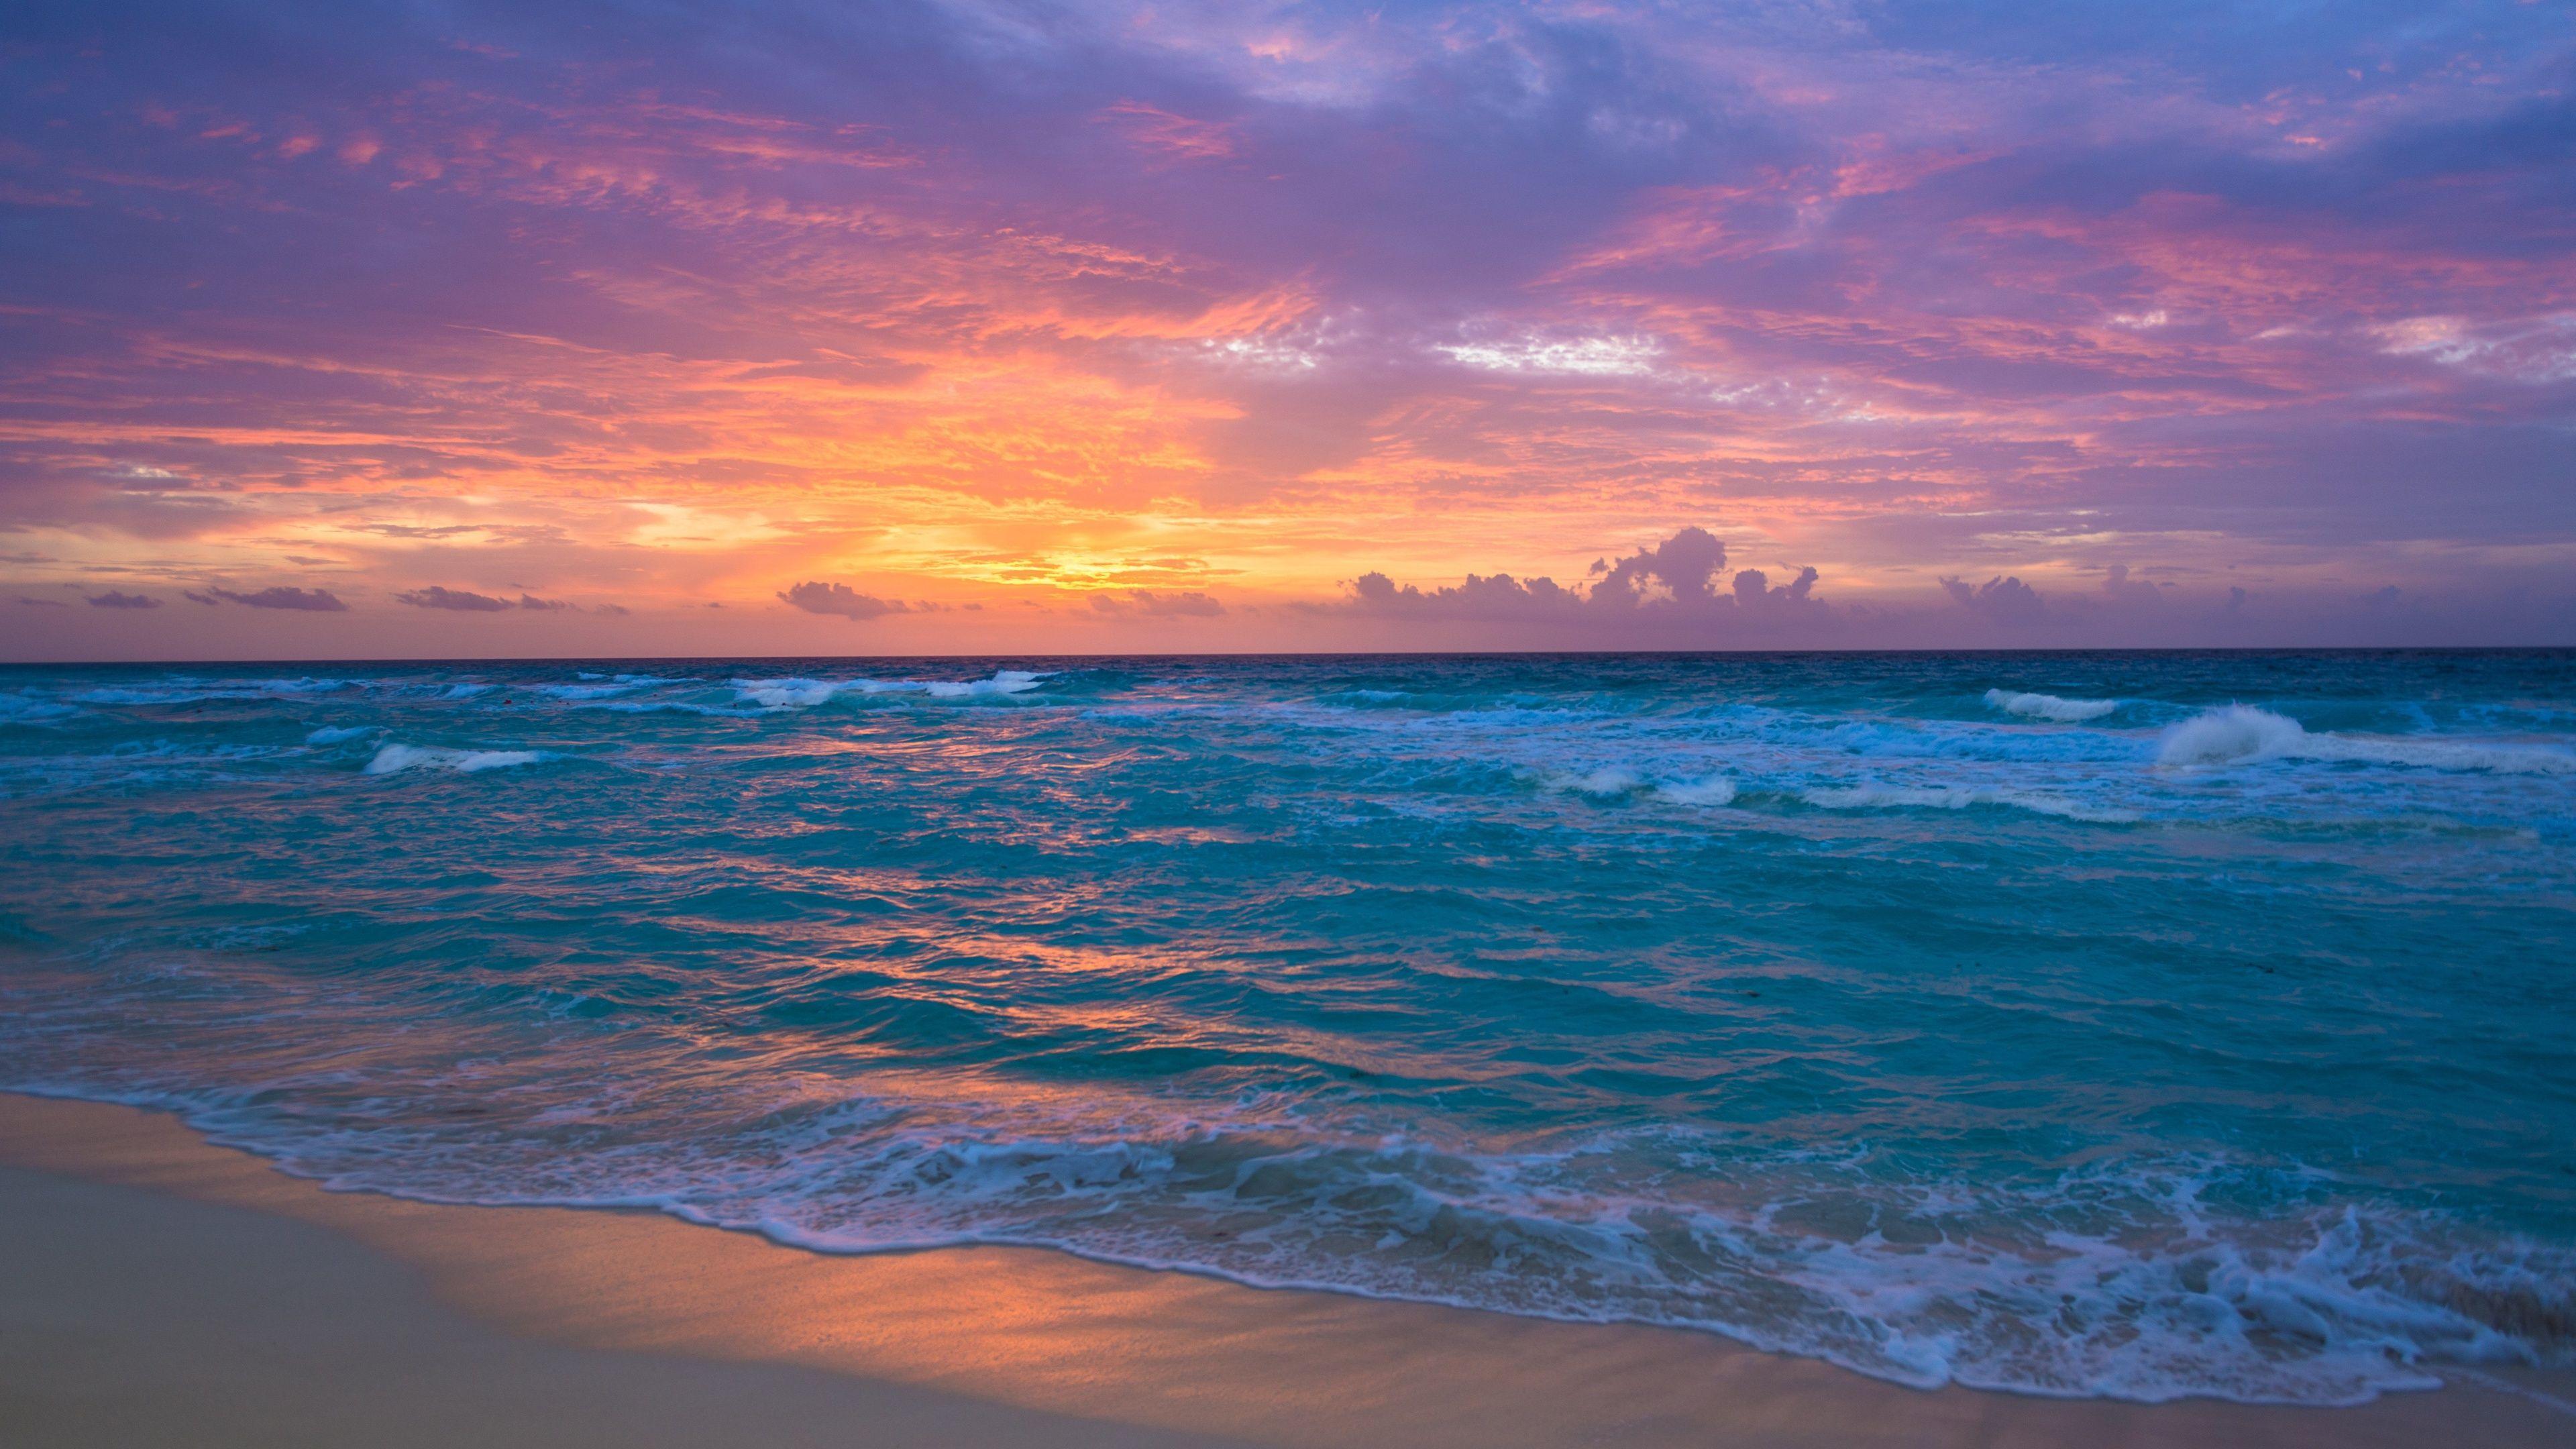 Ocean 4k Ipad Wallpapers Top Free Ocean 4k Ipad